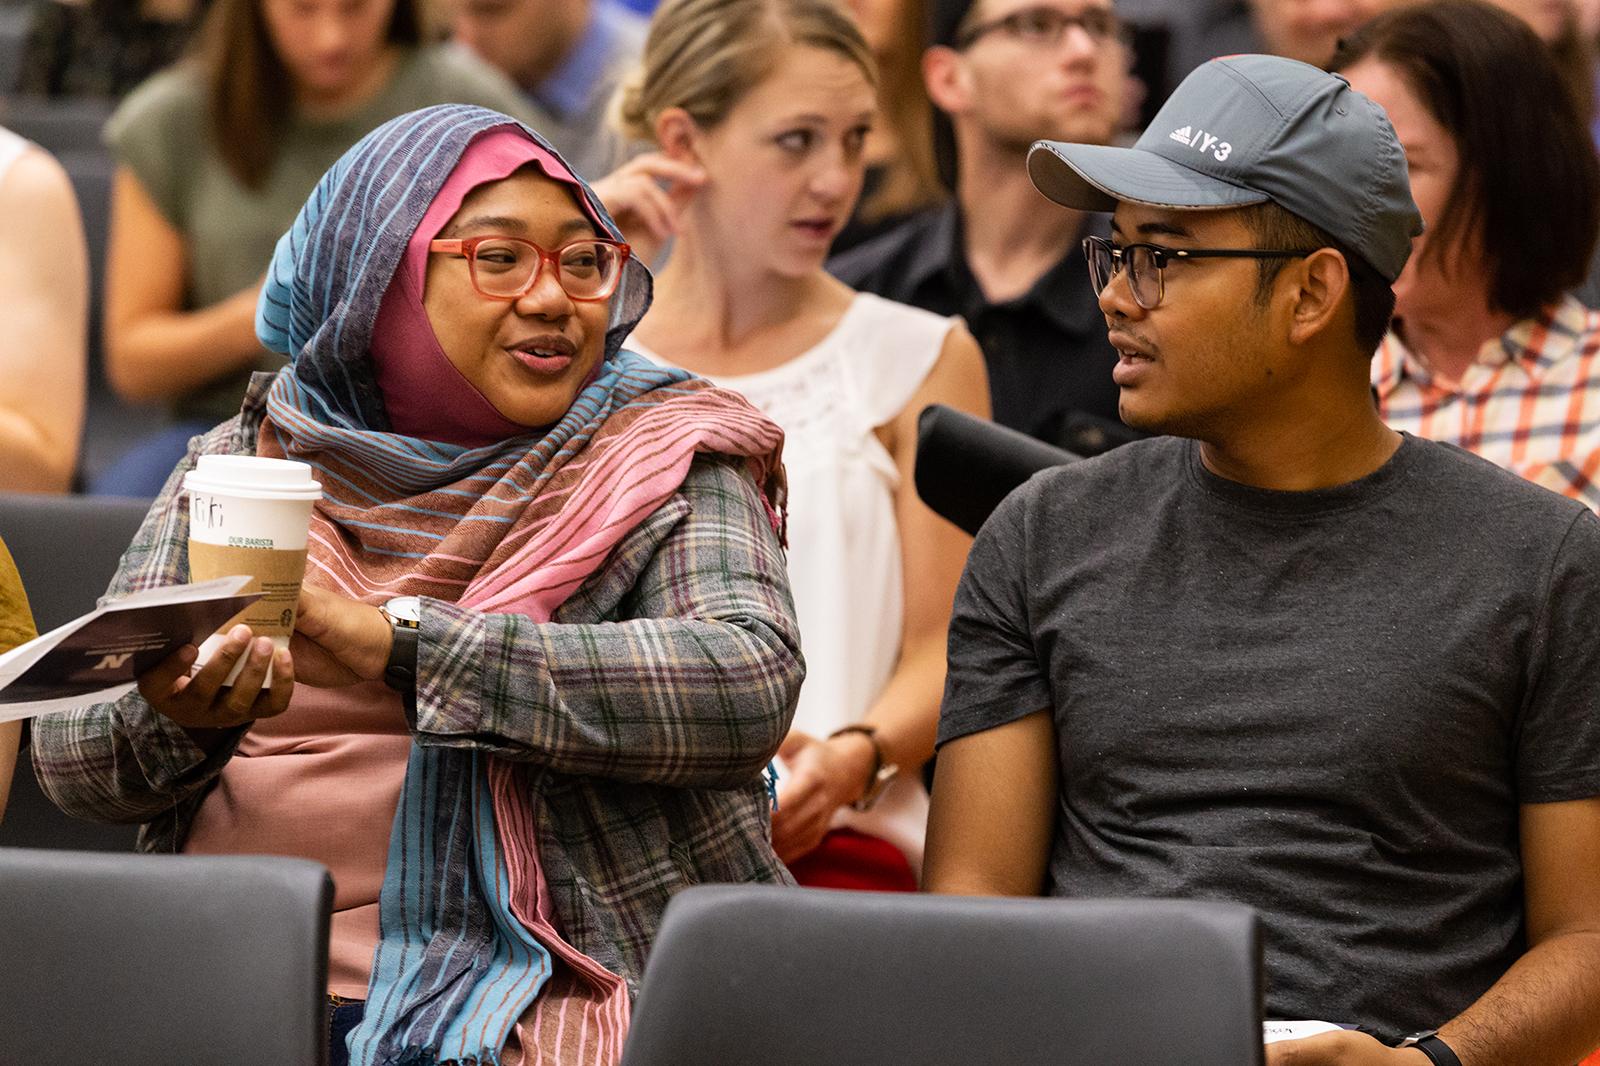 New graduate students conversing at graduate student orientation.